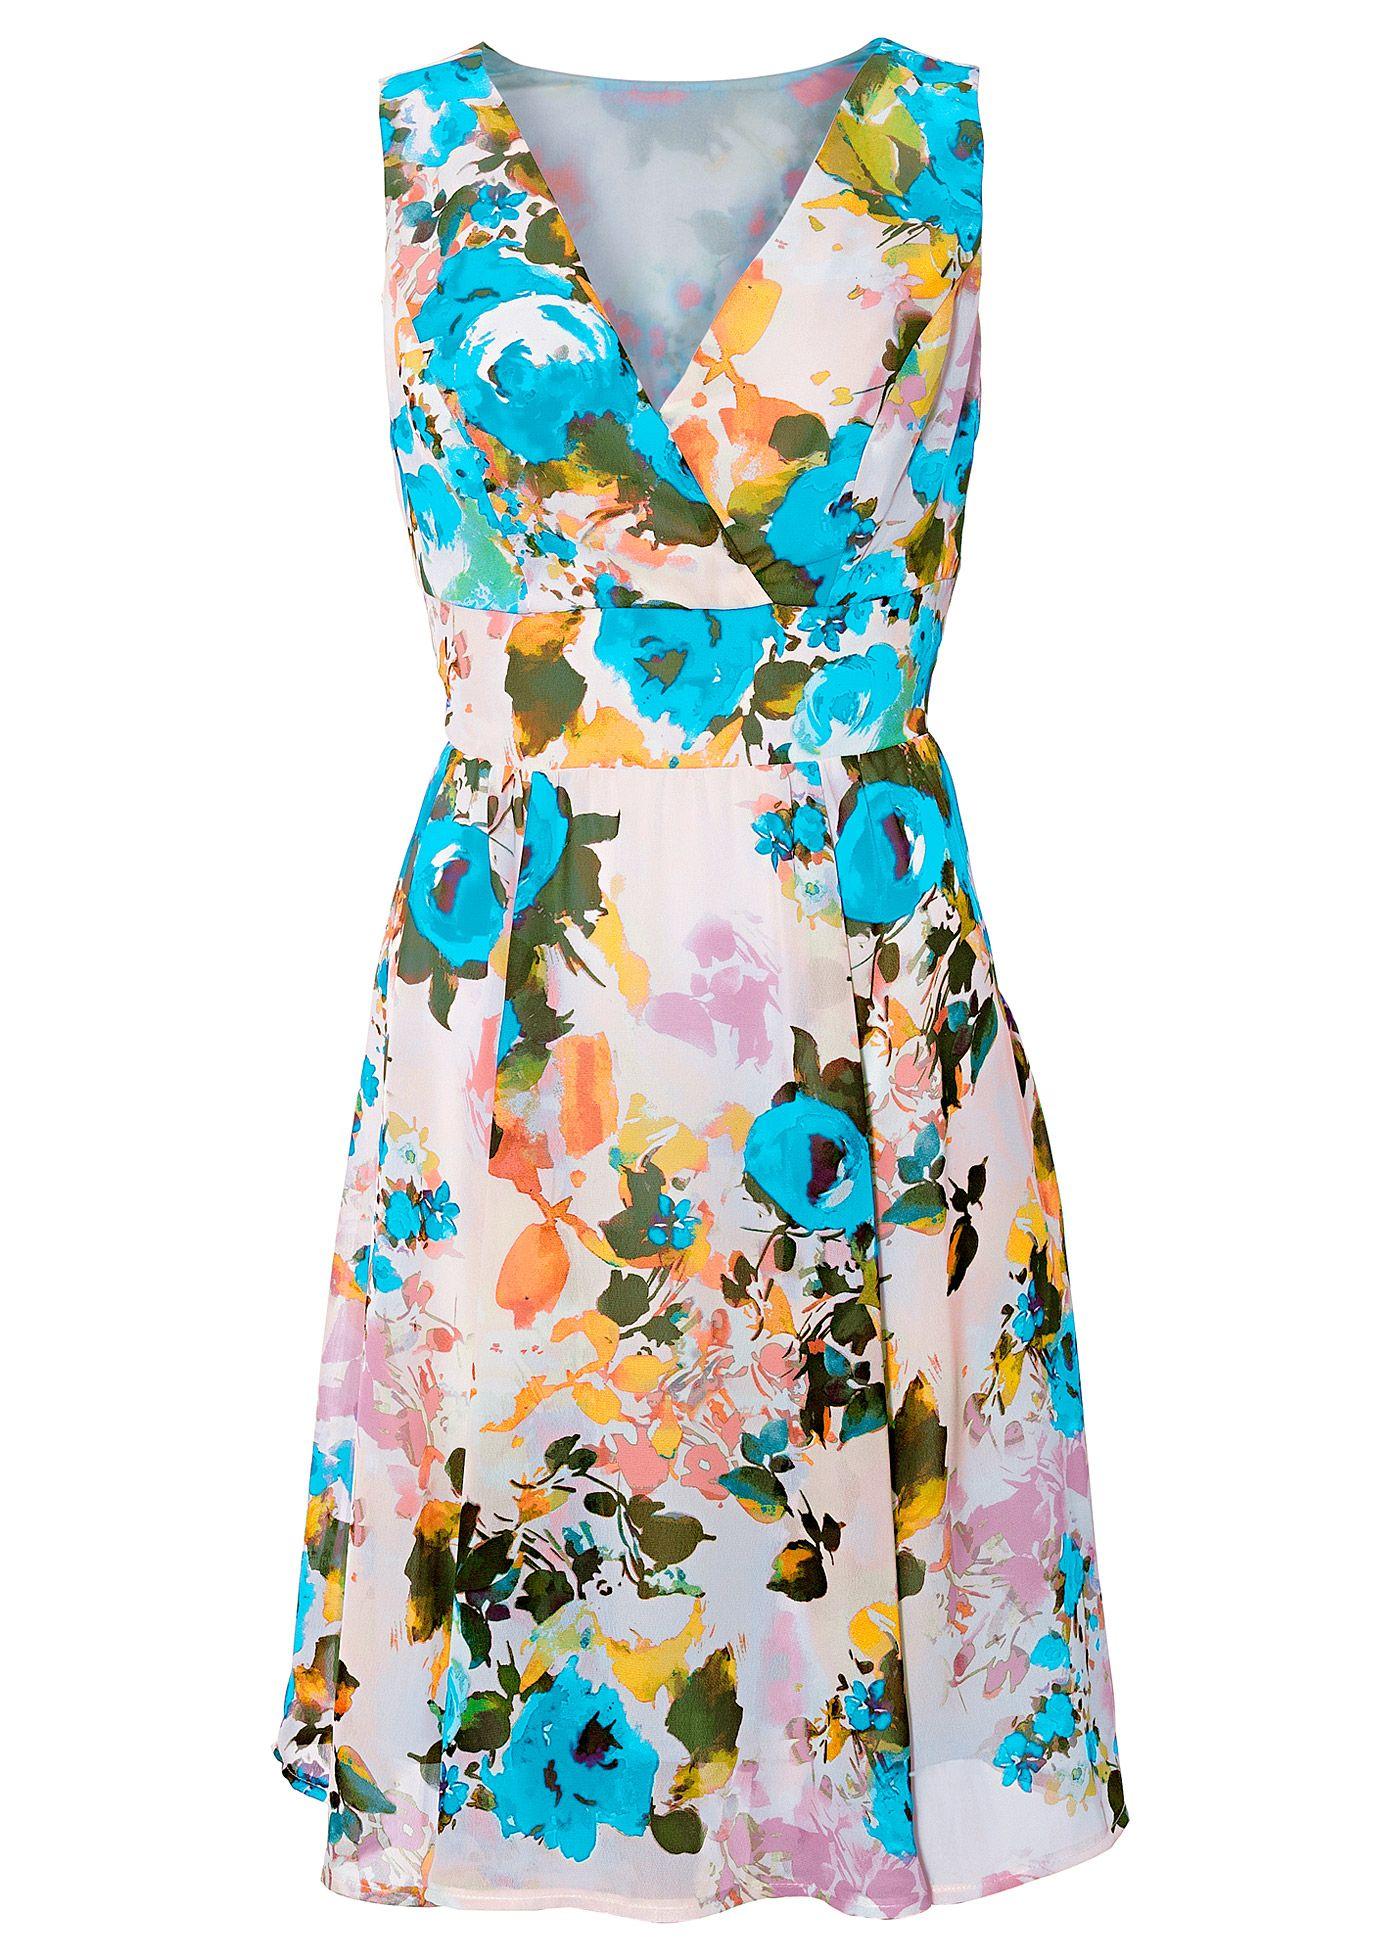 3fe626722 Vestido estampado de chiffon azul estampado encomendar agora na loja  on-line bonprix.de R  99